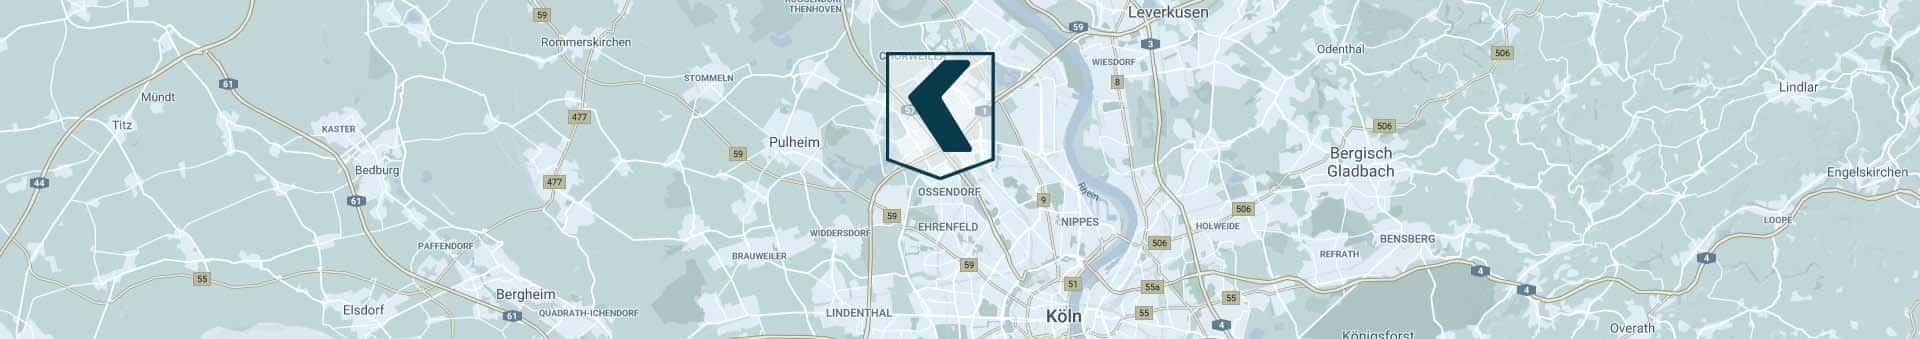 SAP Business One Konsultec GmbH Standort Location